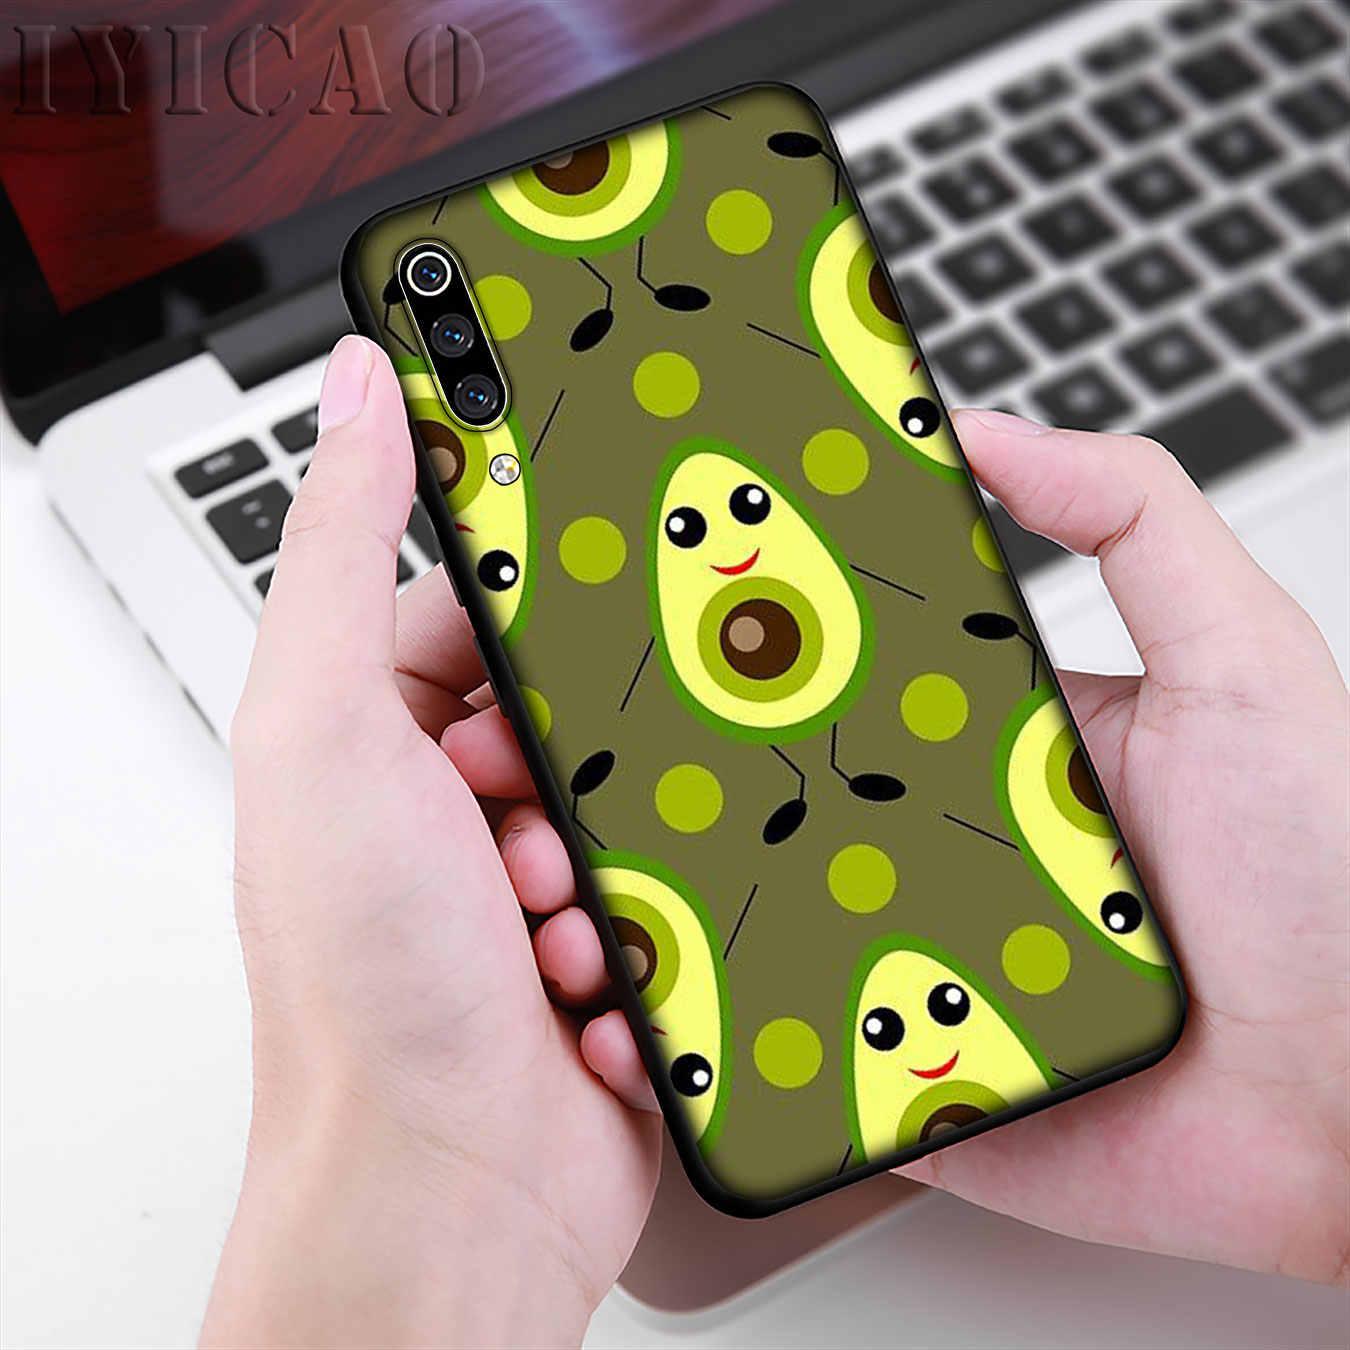 IYICAO Liefhebbers Druif Fruit Art Avocado Zachte Telefoon Case voor Xiao mi mi 9 9 t A3 PRO CC9 CC9E 8 A2 Lite A1 6 6X 5X pocophone f1 MAX 3